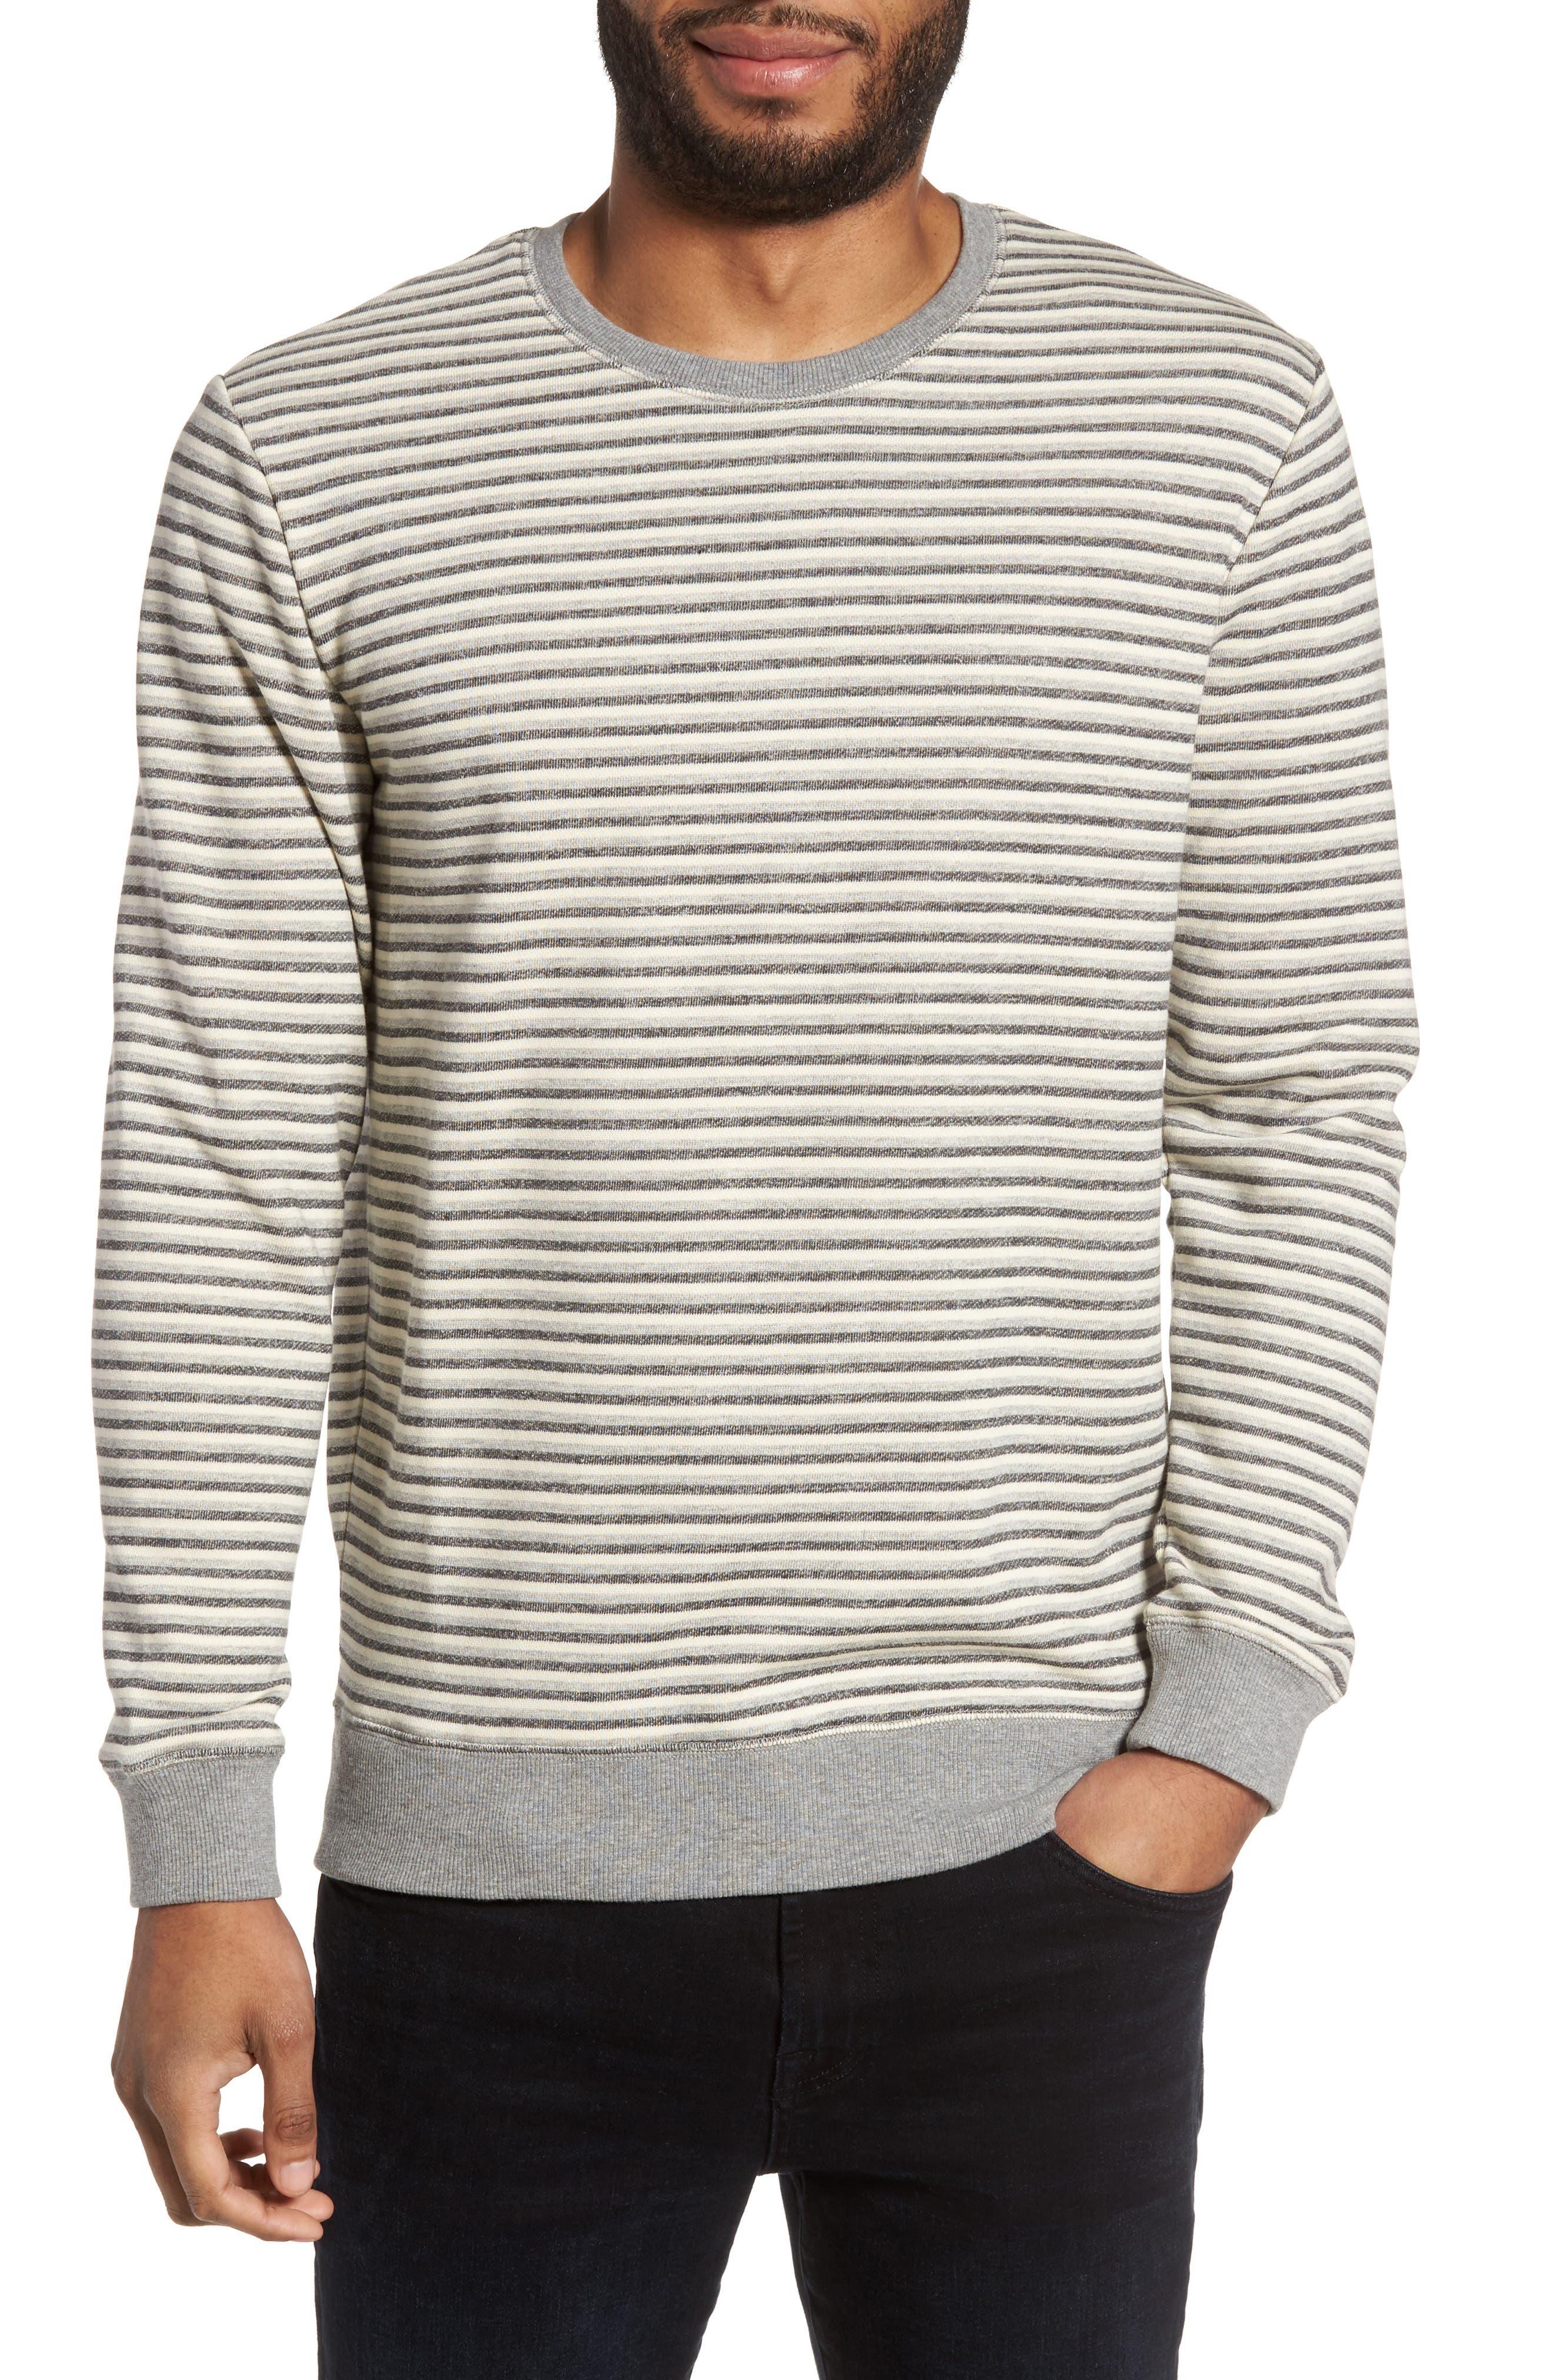 Slate & Stone Stripe Crewneck Sweatshirt